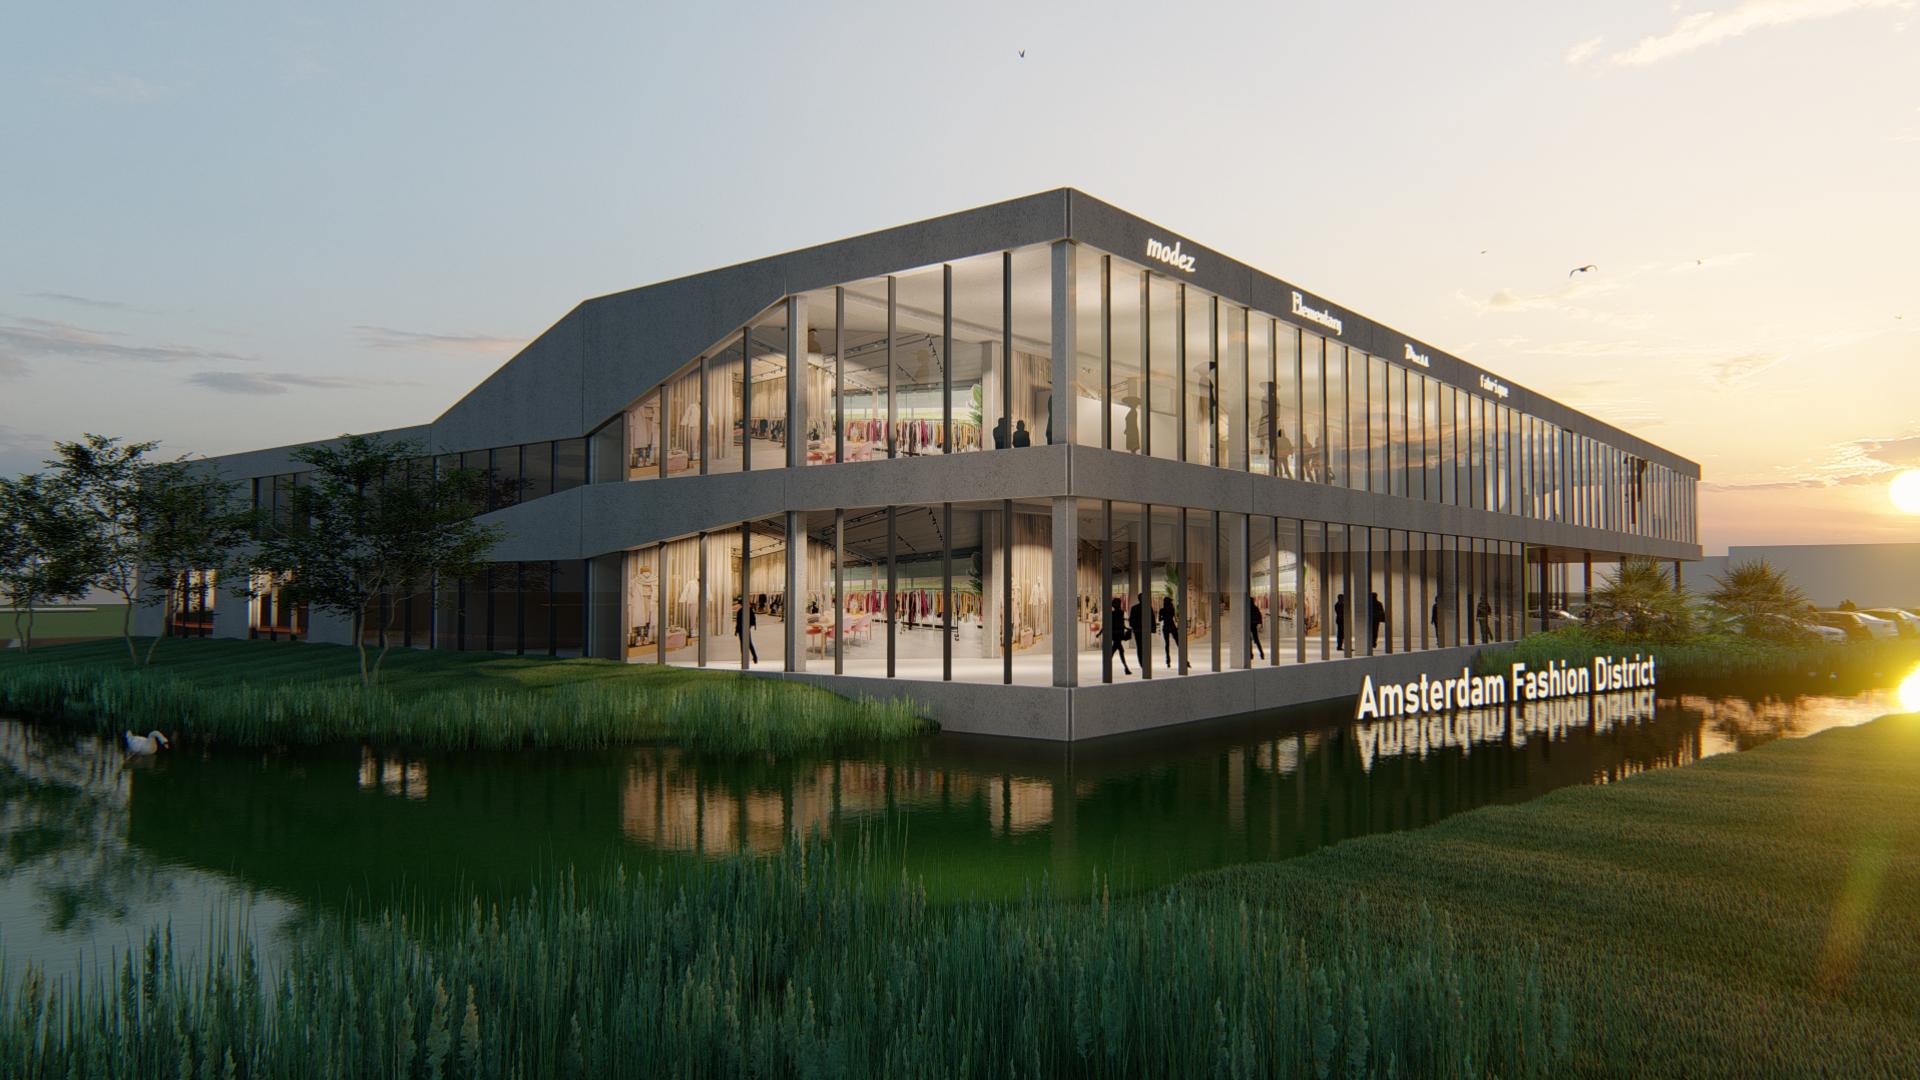 Amsterdam Fashion District